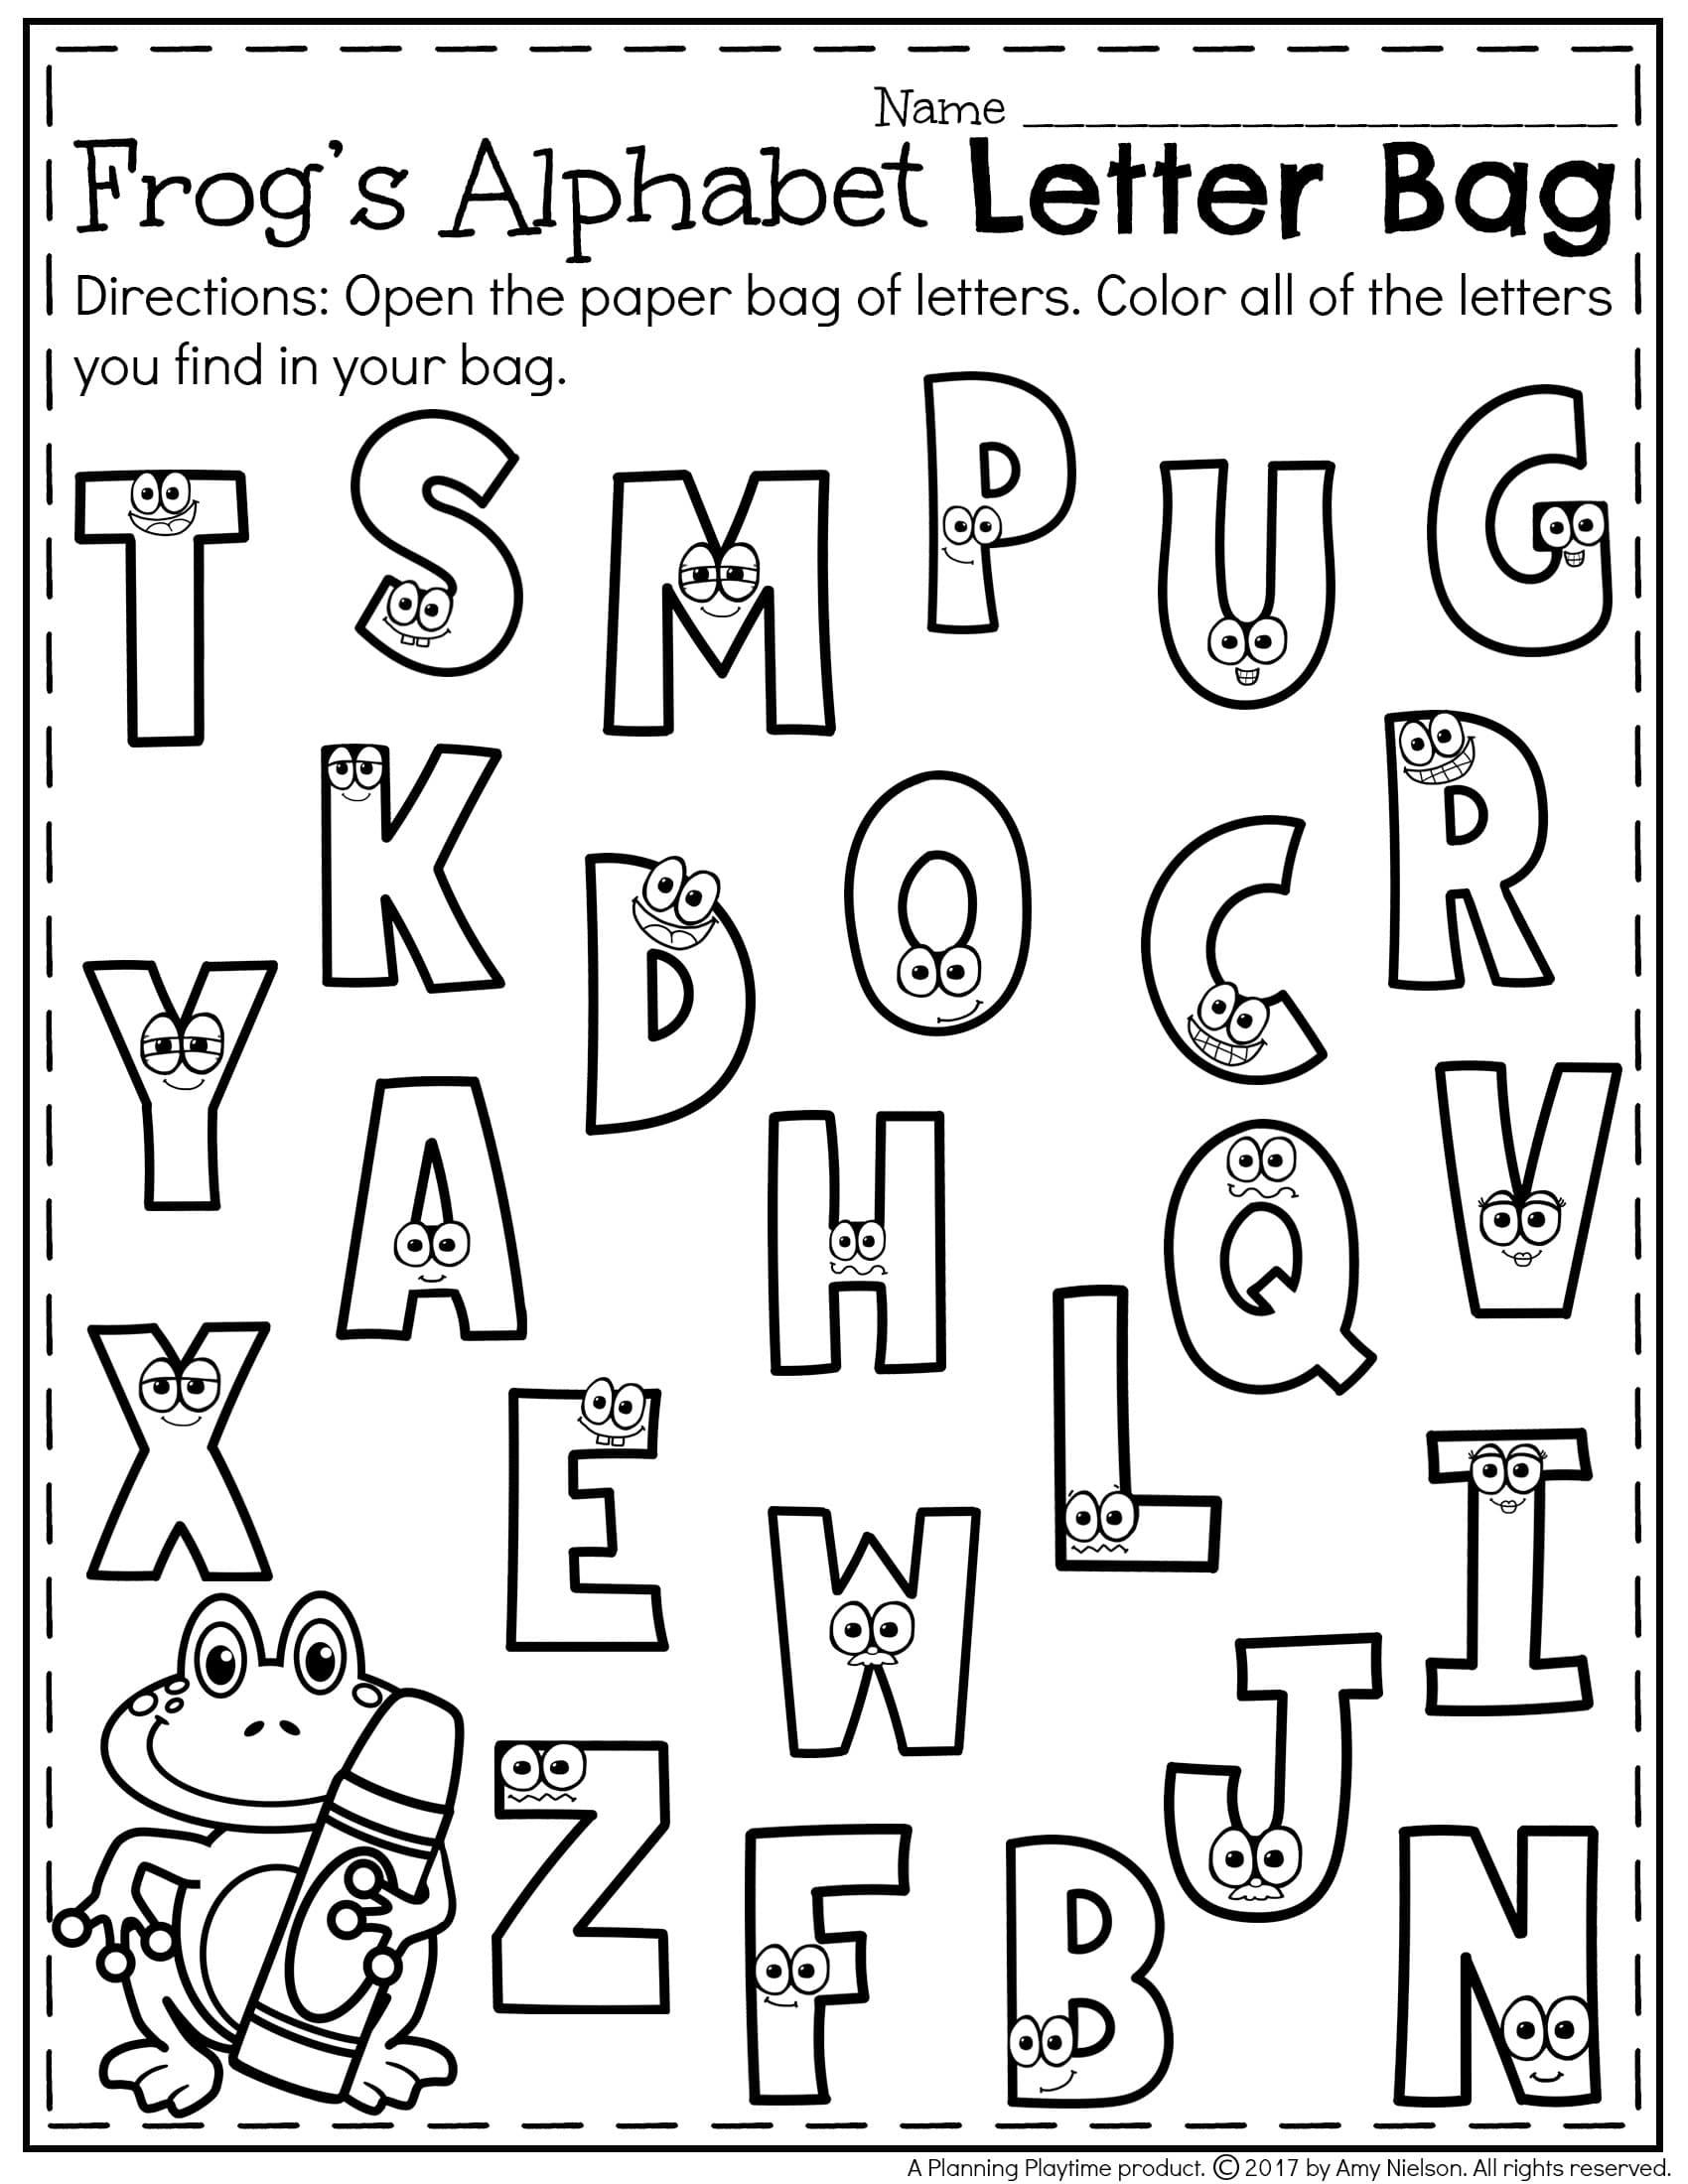 Preschooler Writing Worksheets Free First Grade Printable regarding Alphabet Worksheets For First Grade